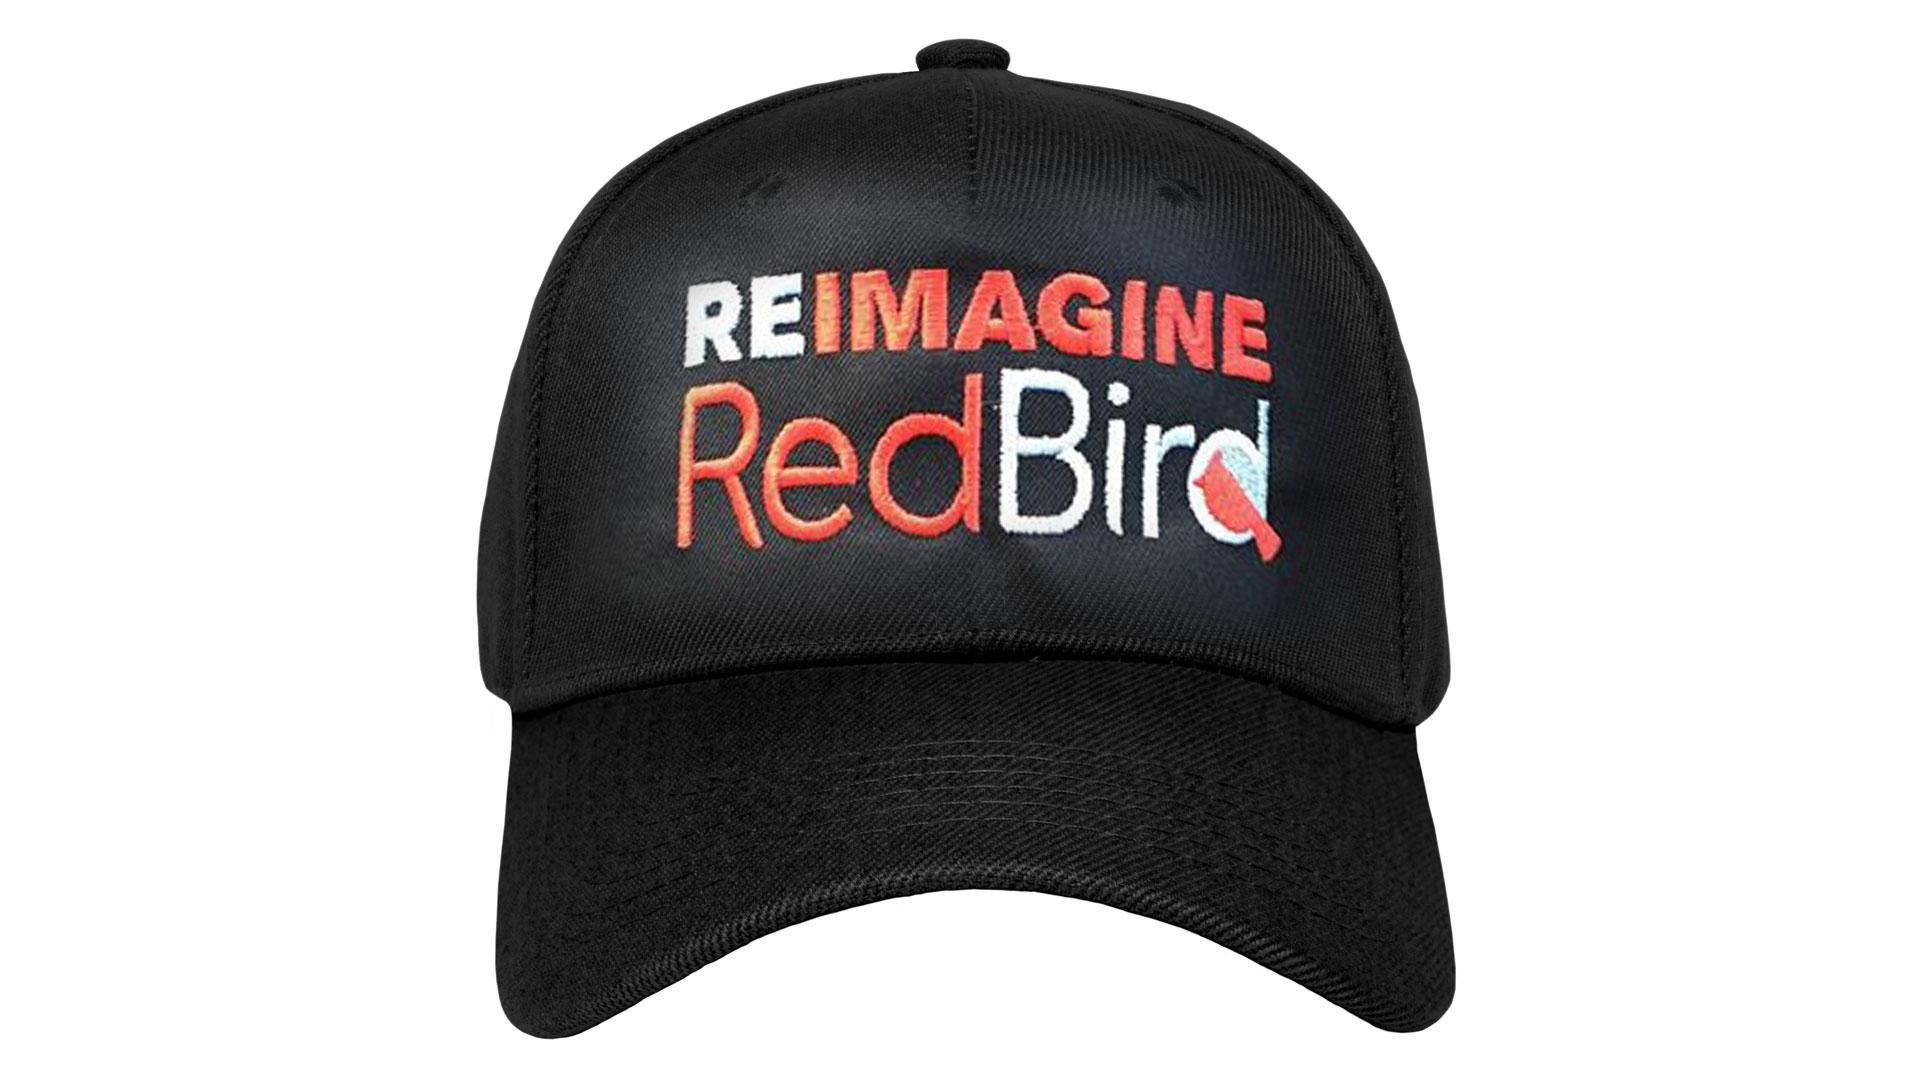 redbird-brand-identity-branded-merchandise